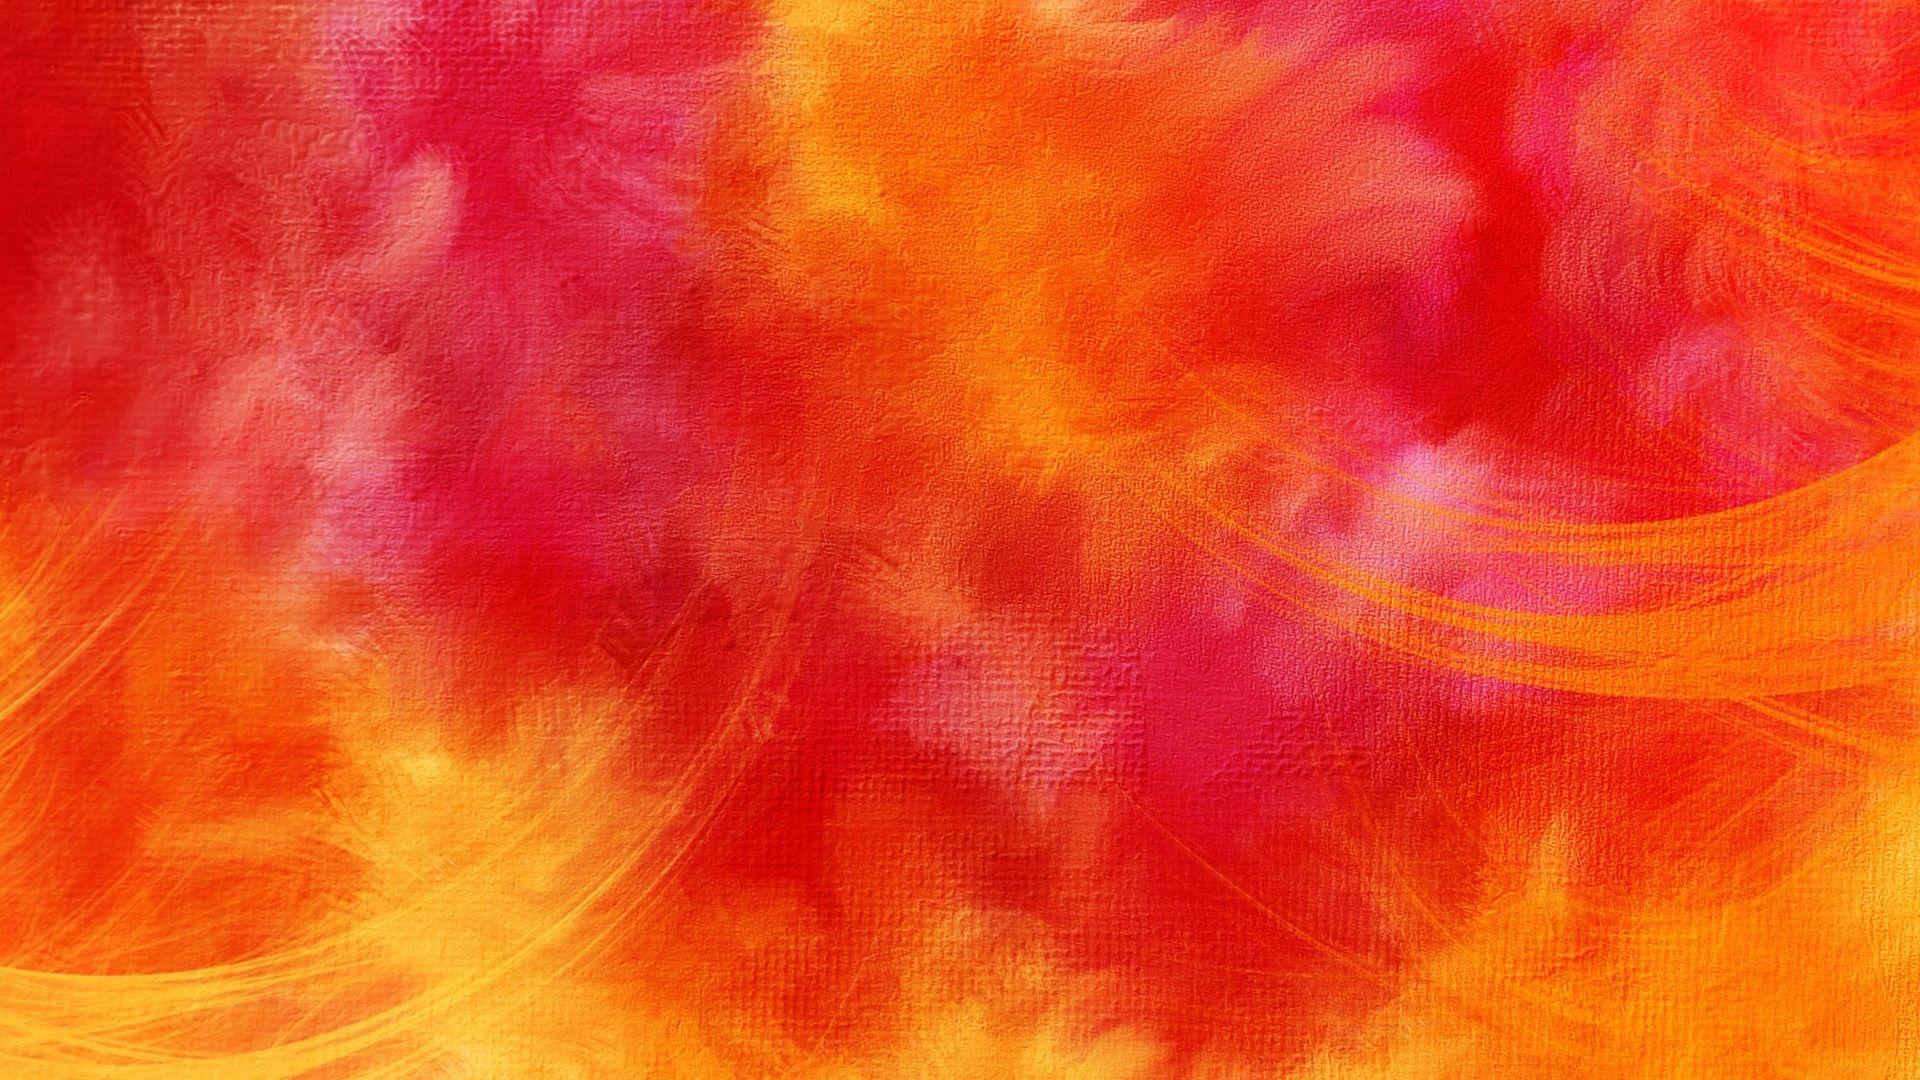 Orange wallpaper photo full hd